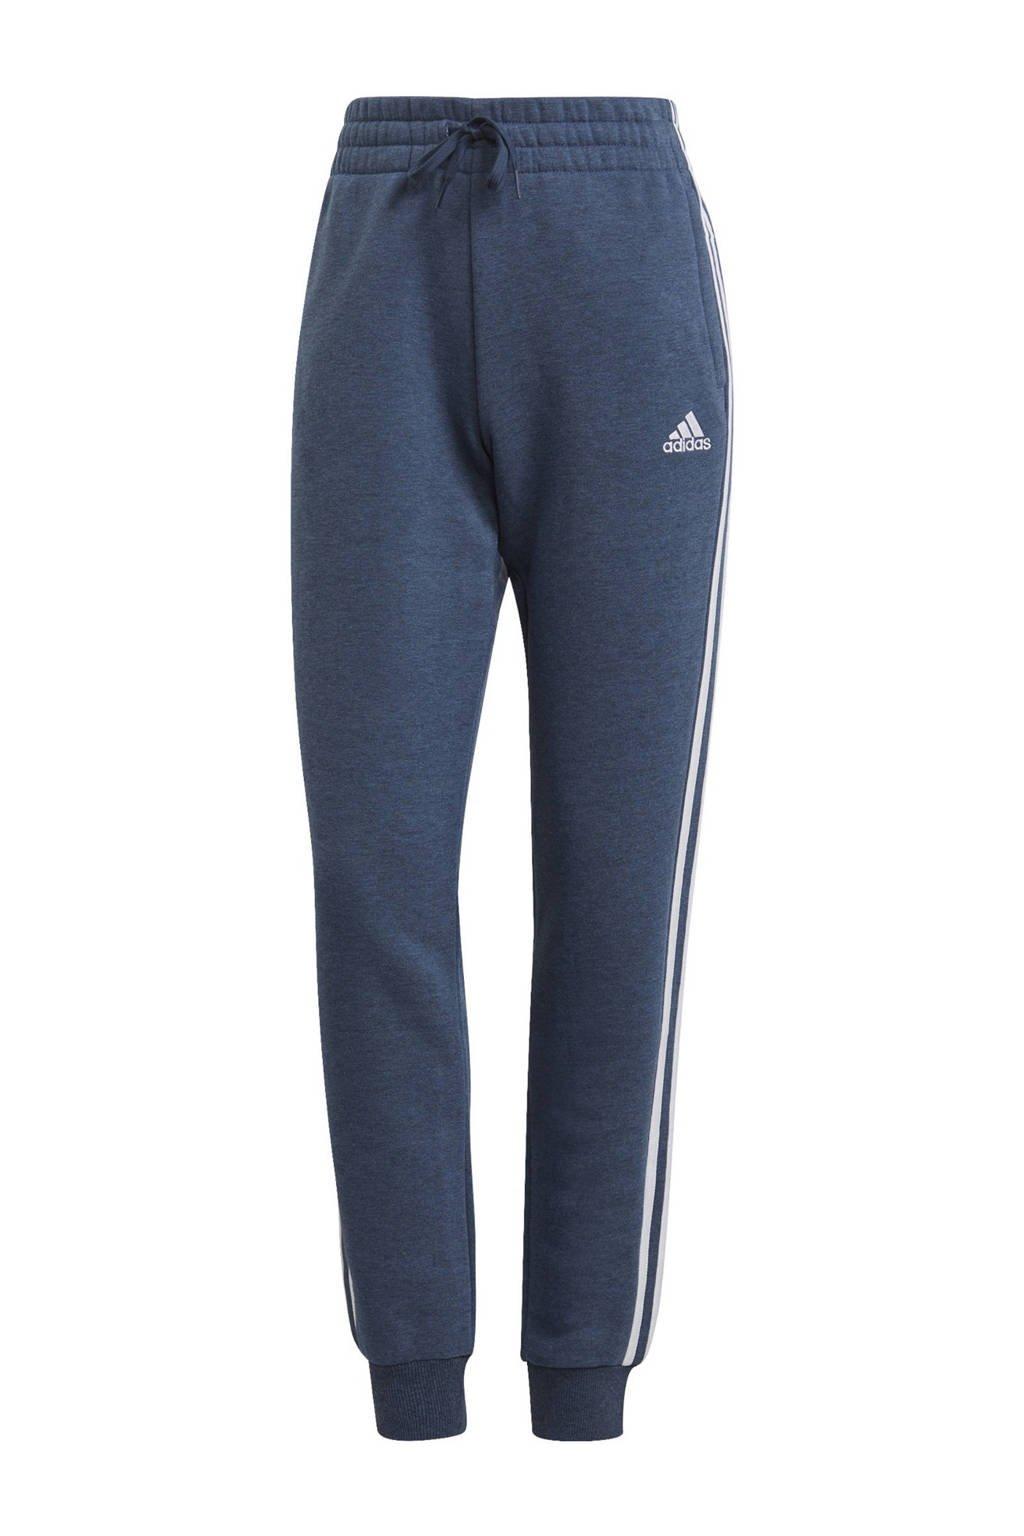 adidas Performance joggingbroek blauw/wit, Blauw/wit